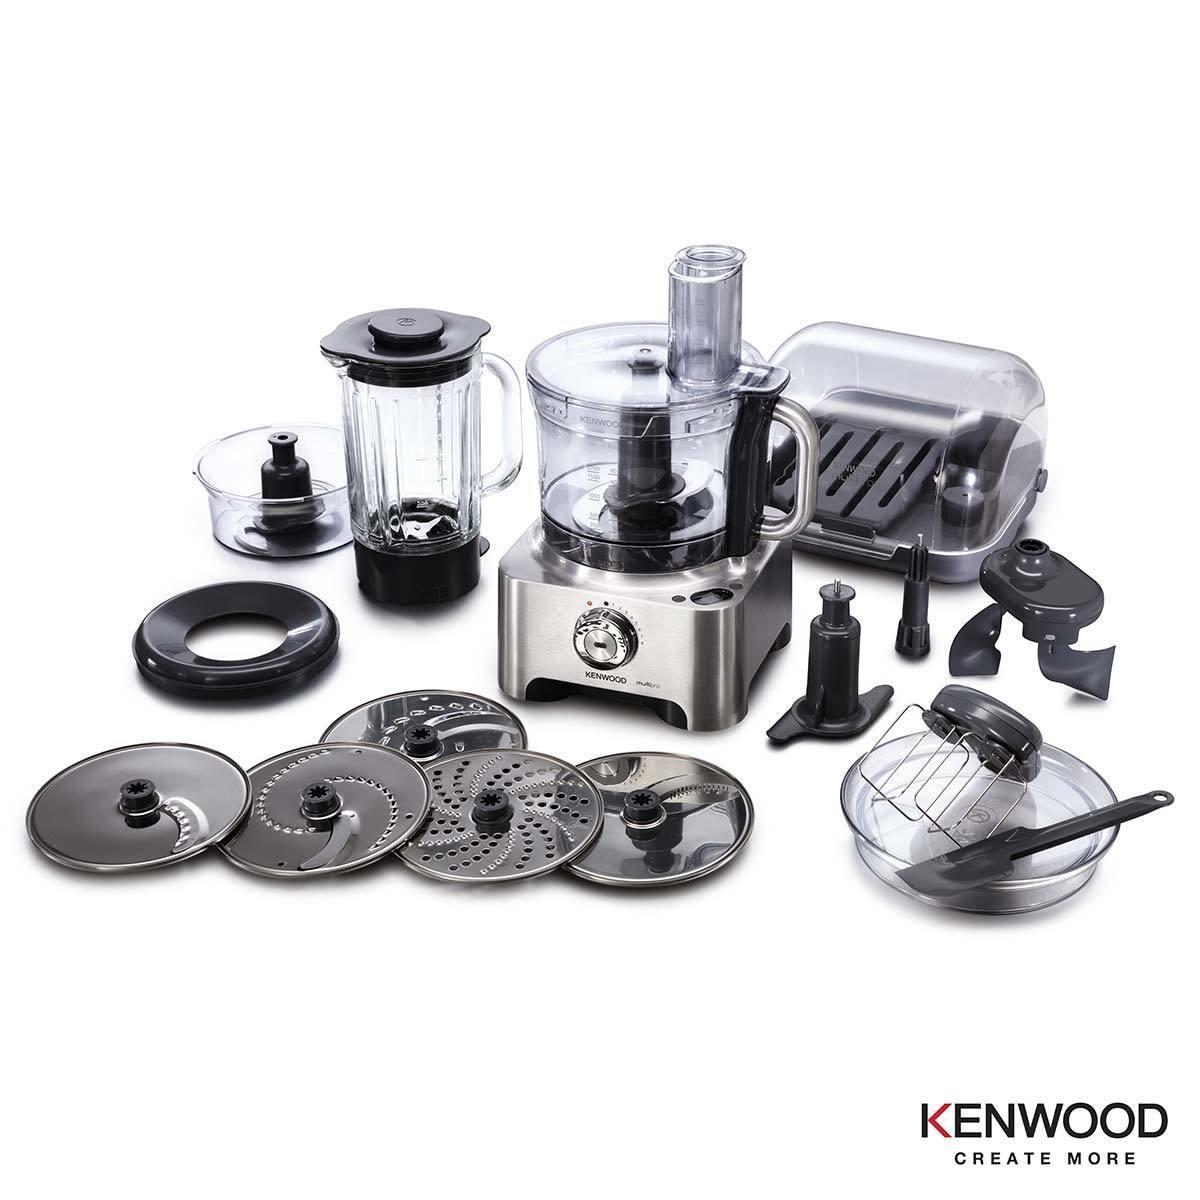 Kenwood Multipro Sense Food Processor, FPM810 - COSTCO online deal - £149.89